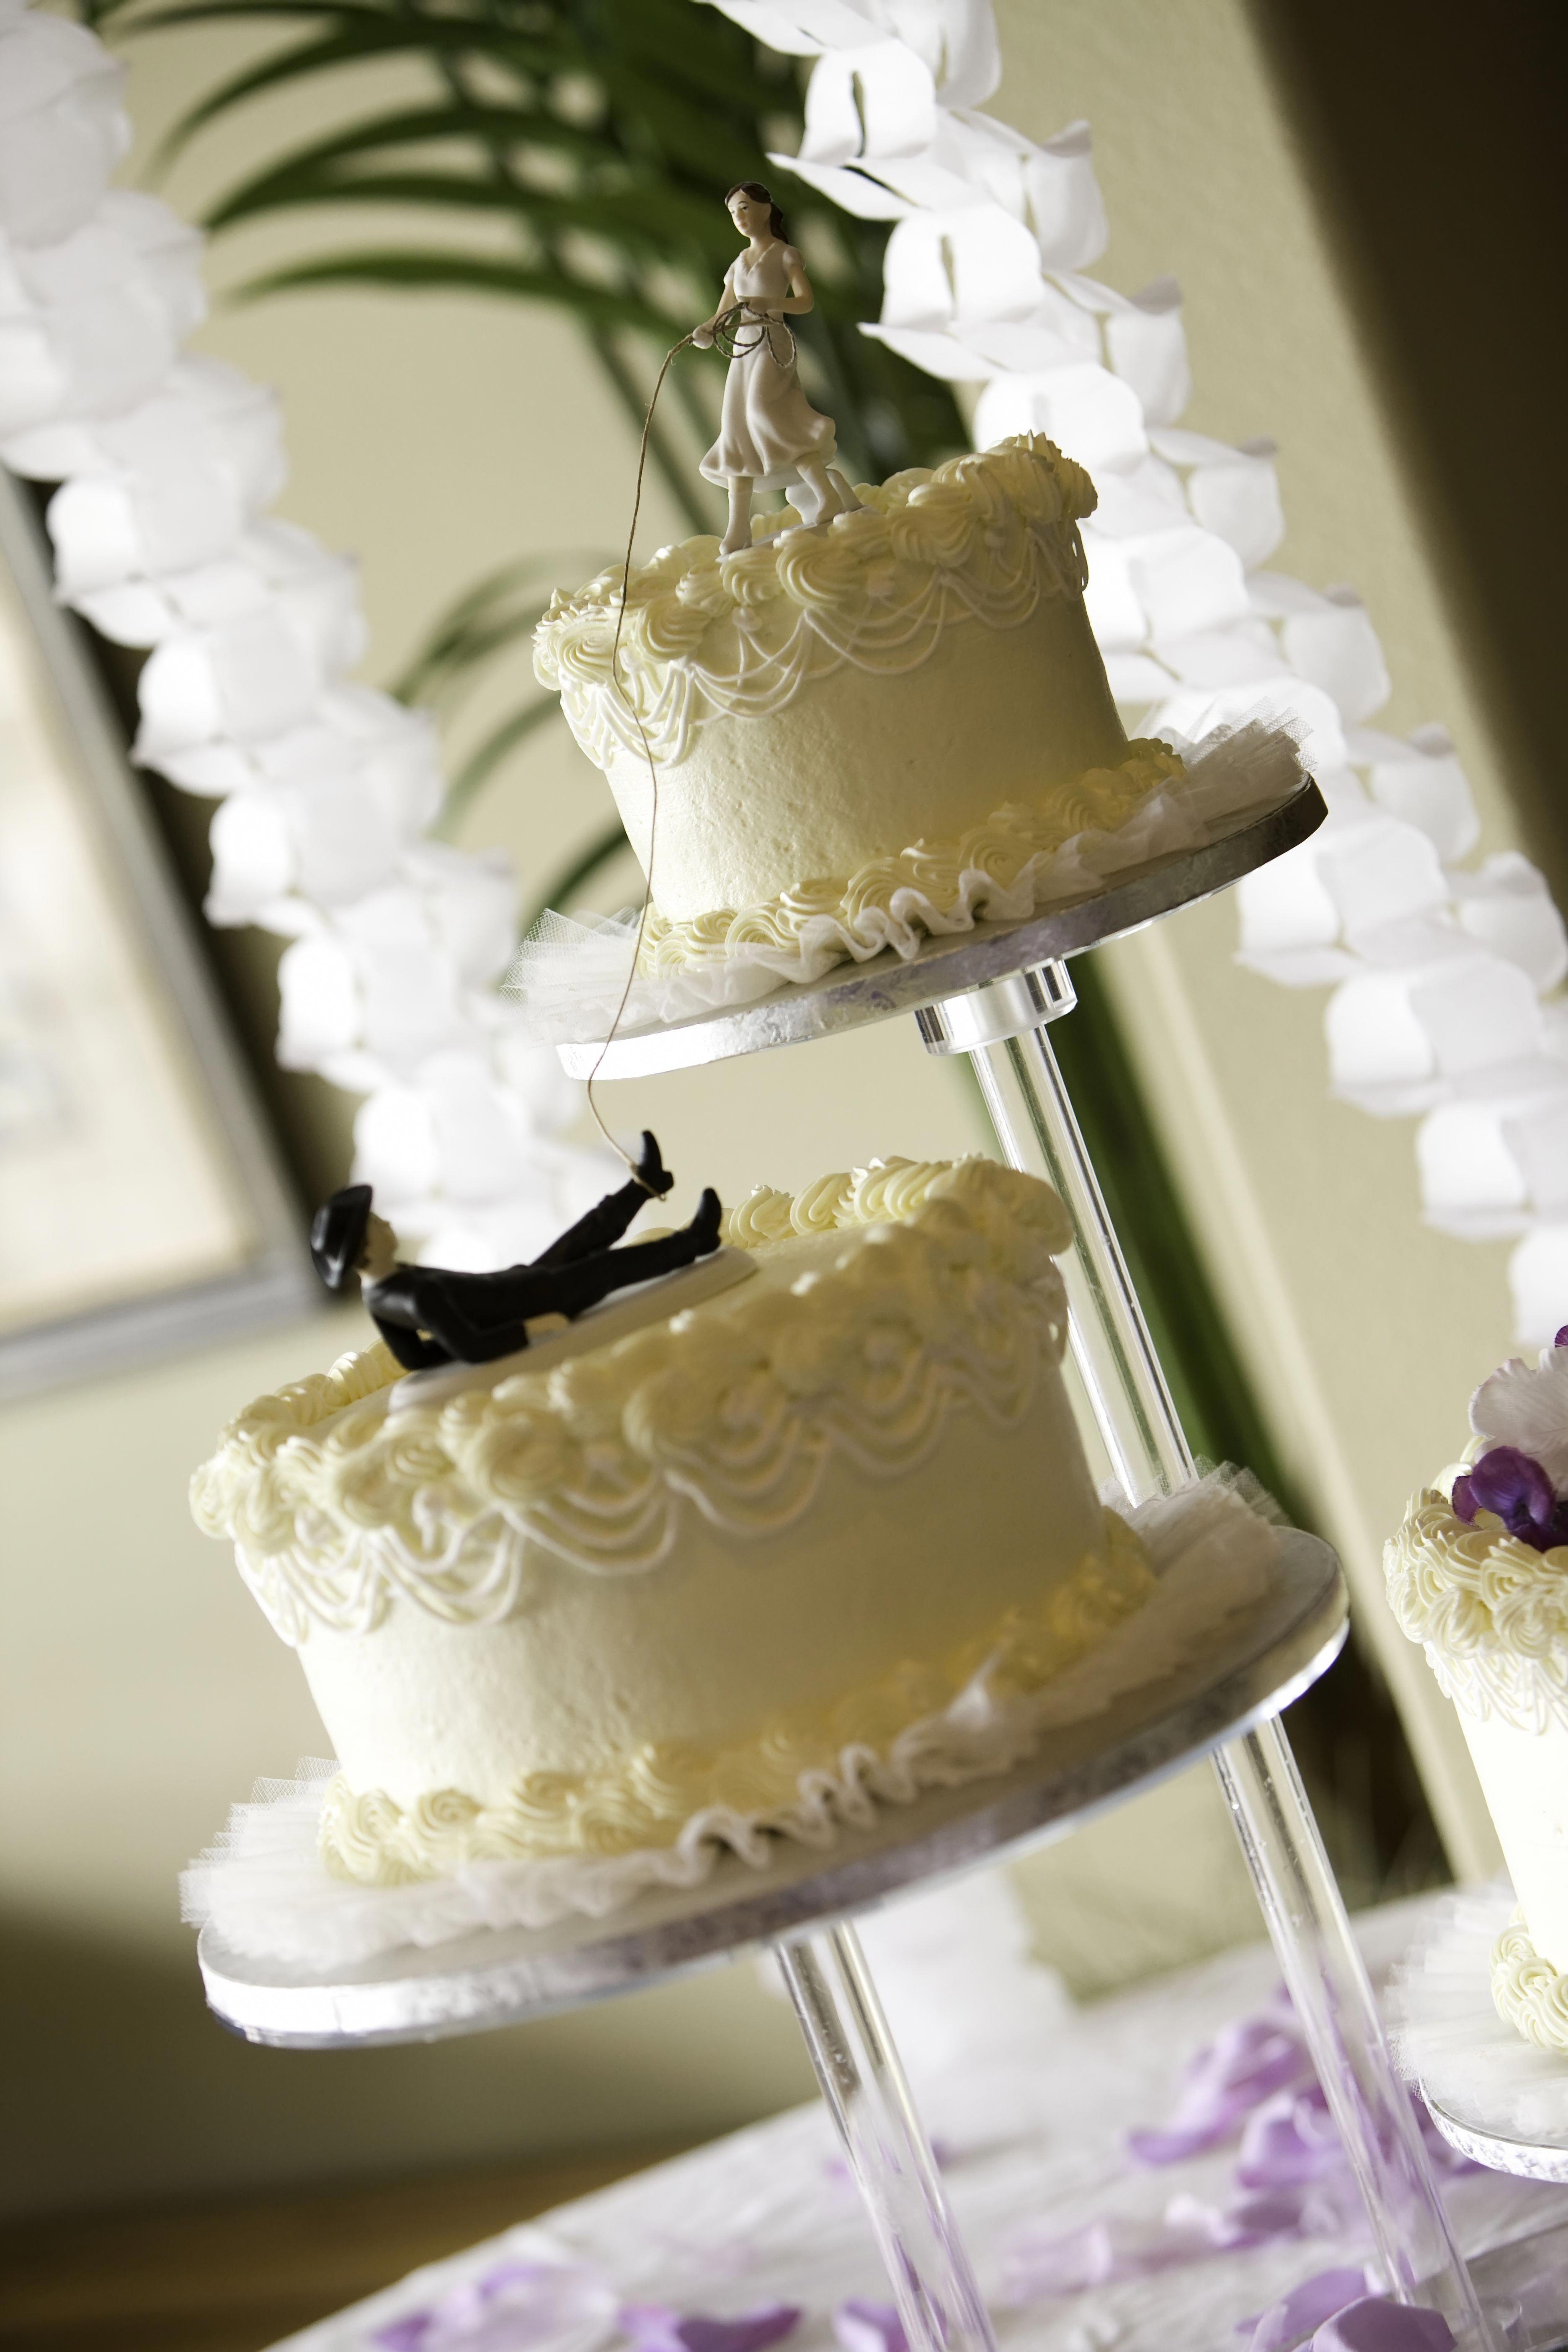 Never under no scenarios place your wedding cake near the